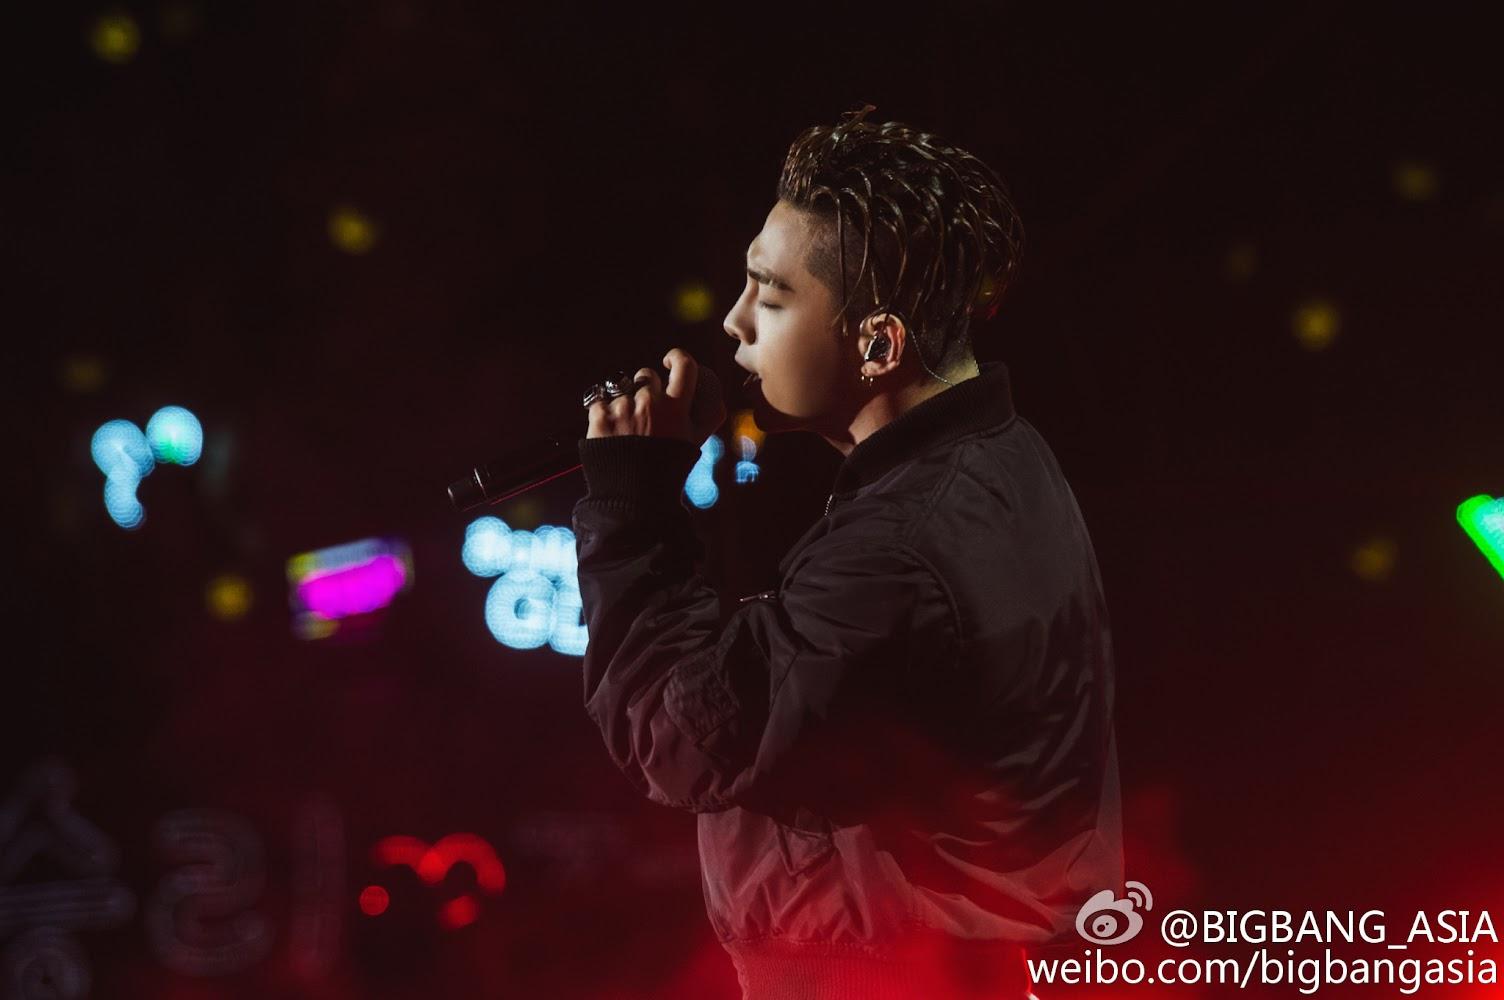 Big Bang - Made V.I.P Tour - Nanjing - 19mar2016 - BIGBANG_ASIA - 08.jpg